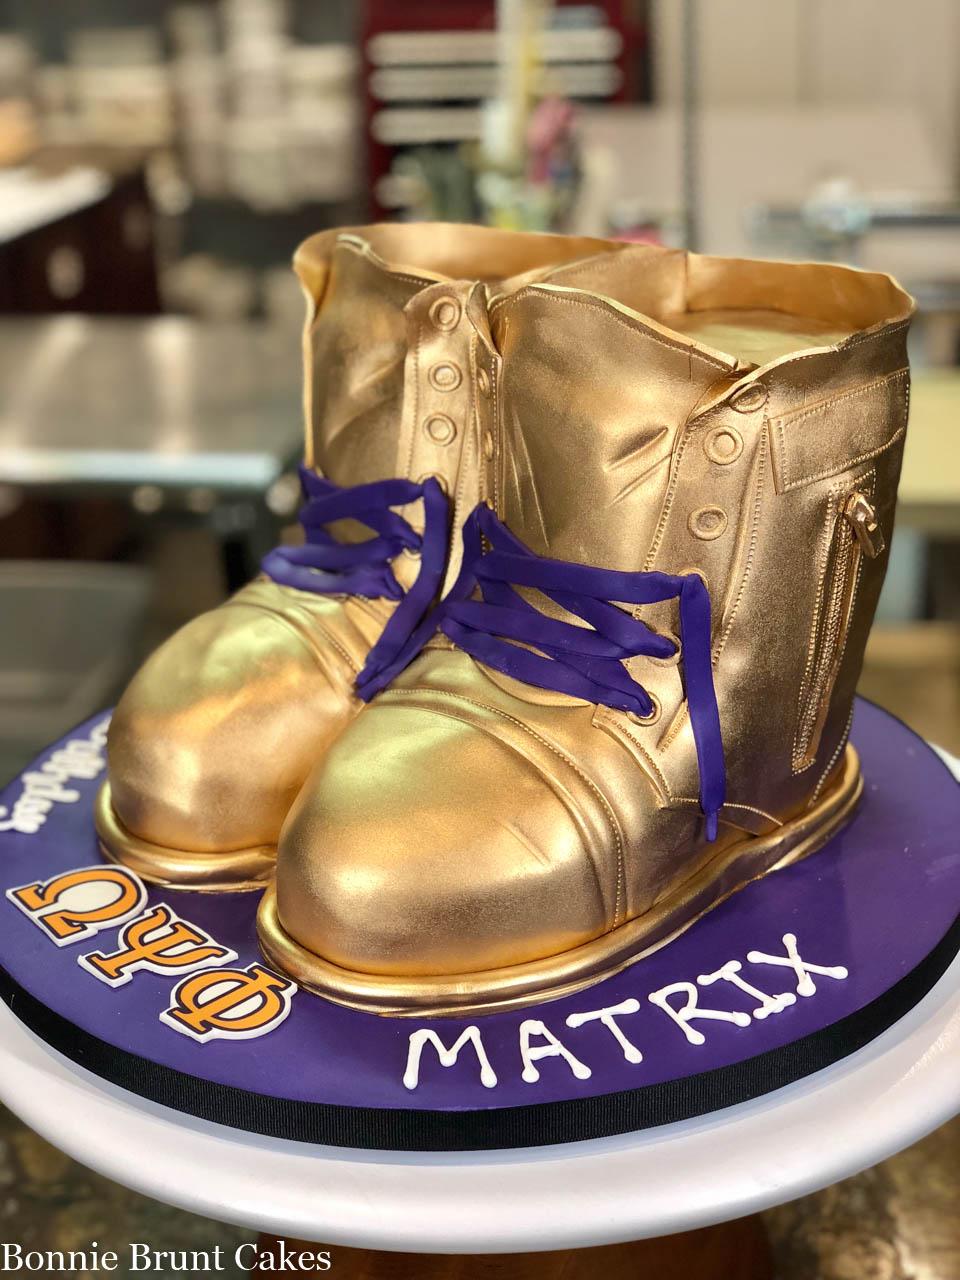 Miraculous Stompin Boots Cake Of The Week Wedding Cakes Grooms Cakes Funny Birthday Cards Online Elaedamsfinfo